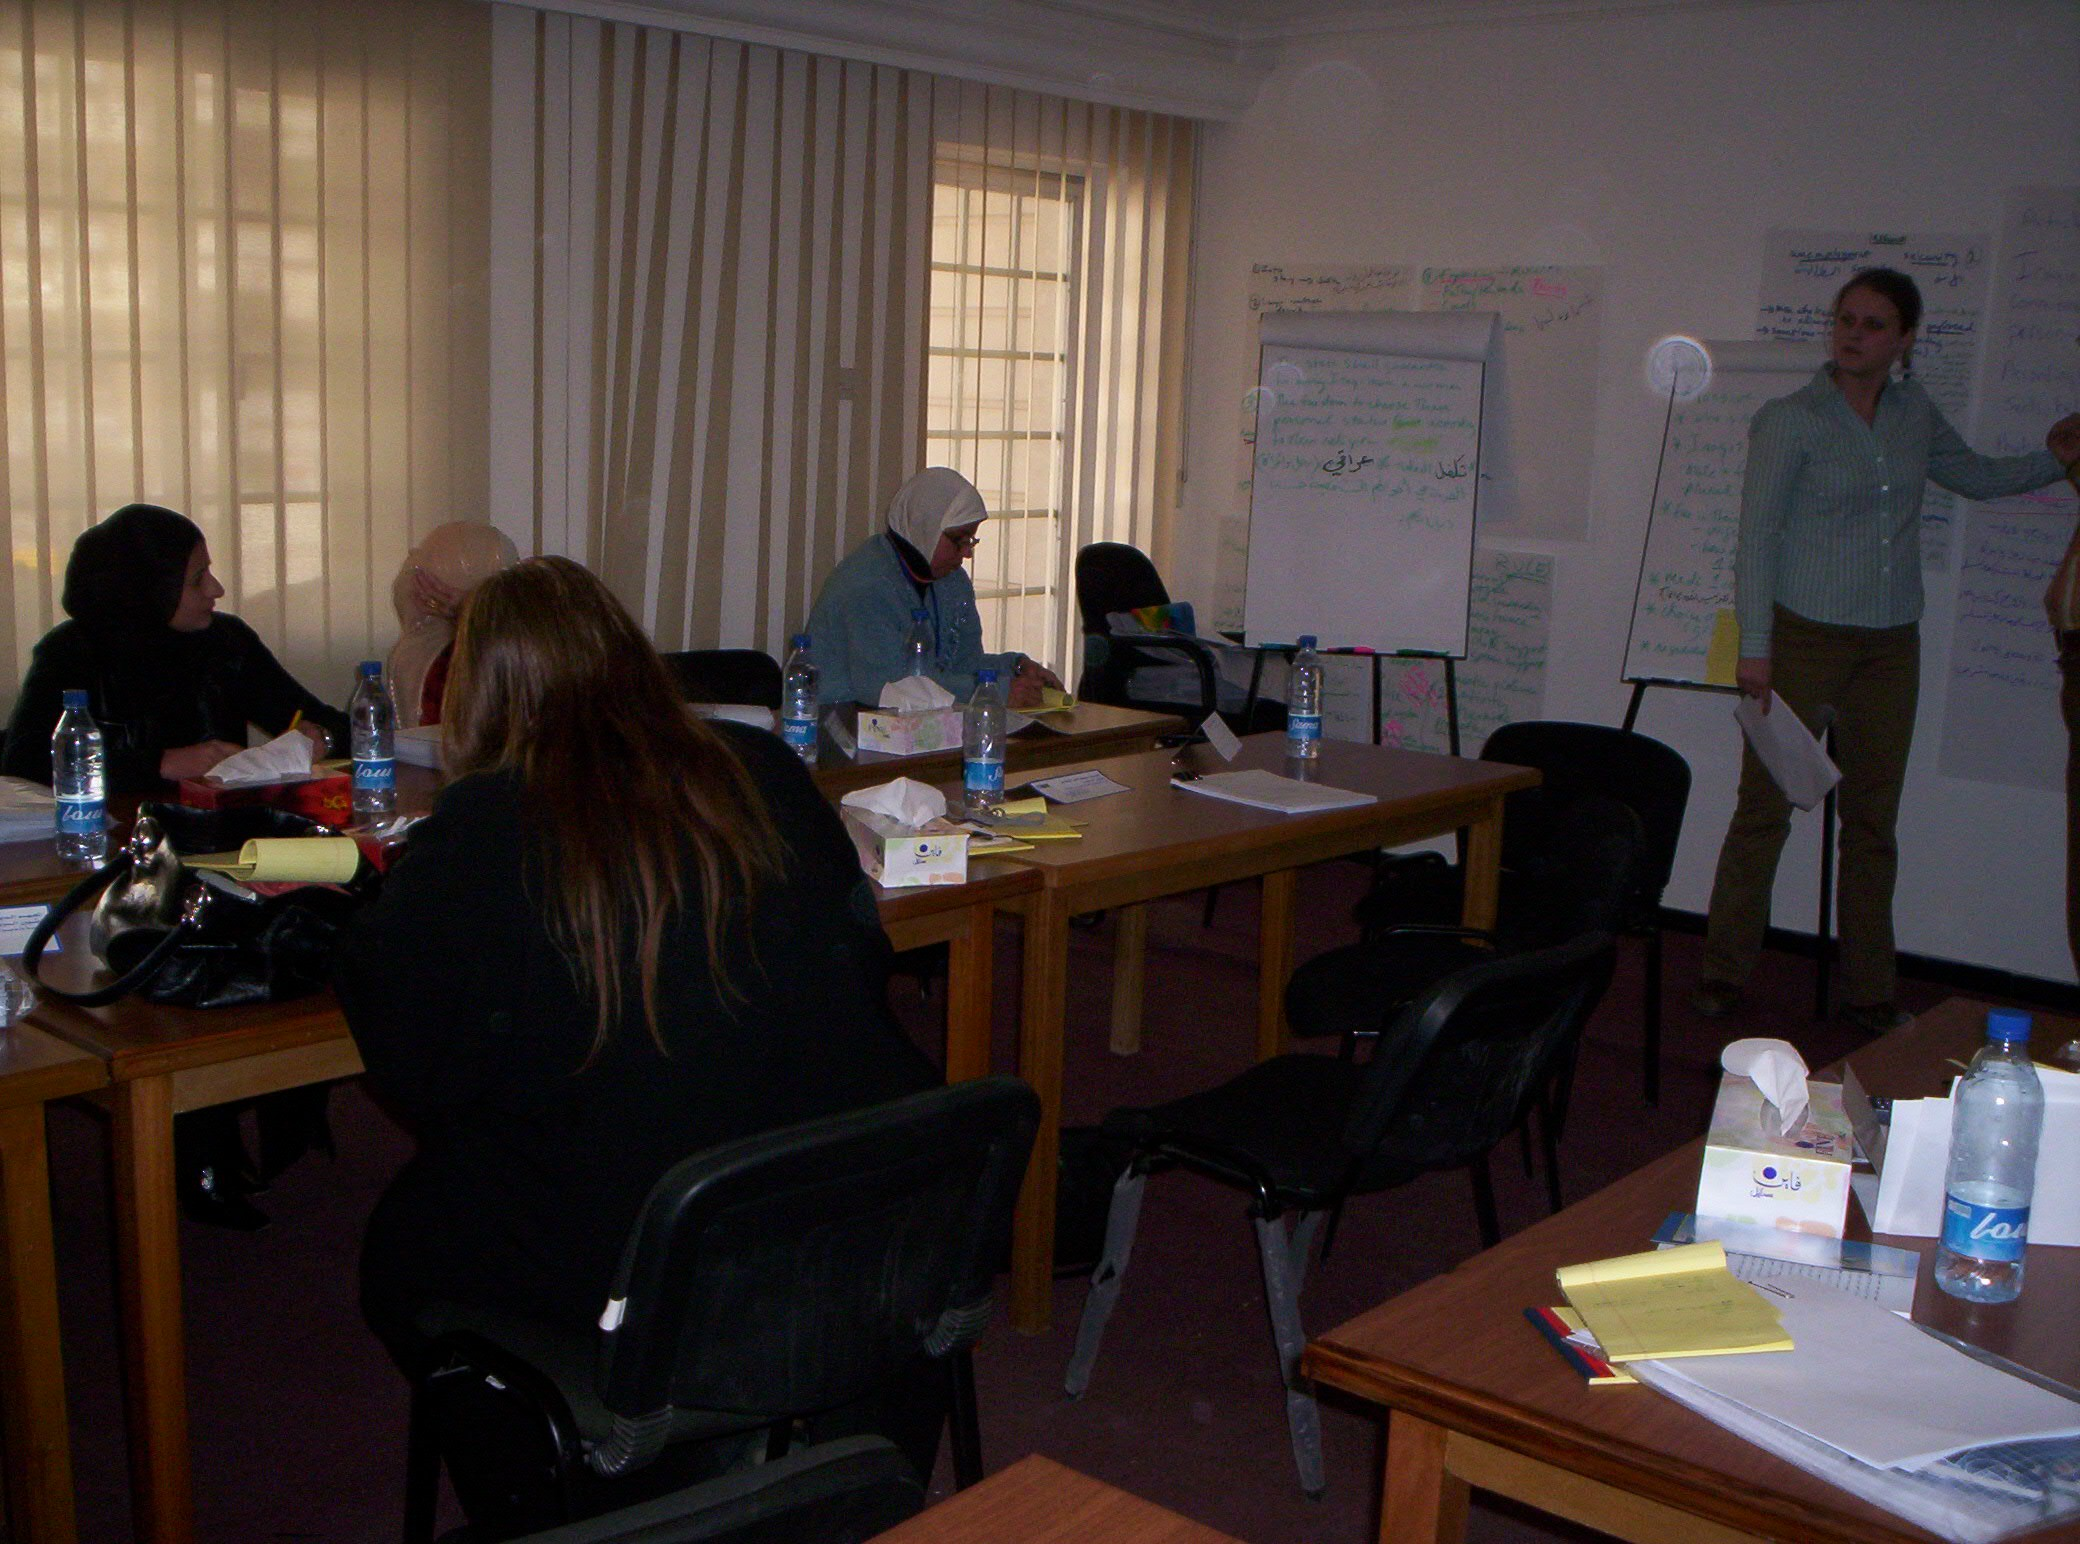 Sara teaching a seminar in Iraq circa 2005.  Image courtesy of Sara Johnson-Steffey.